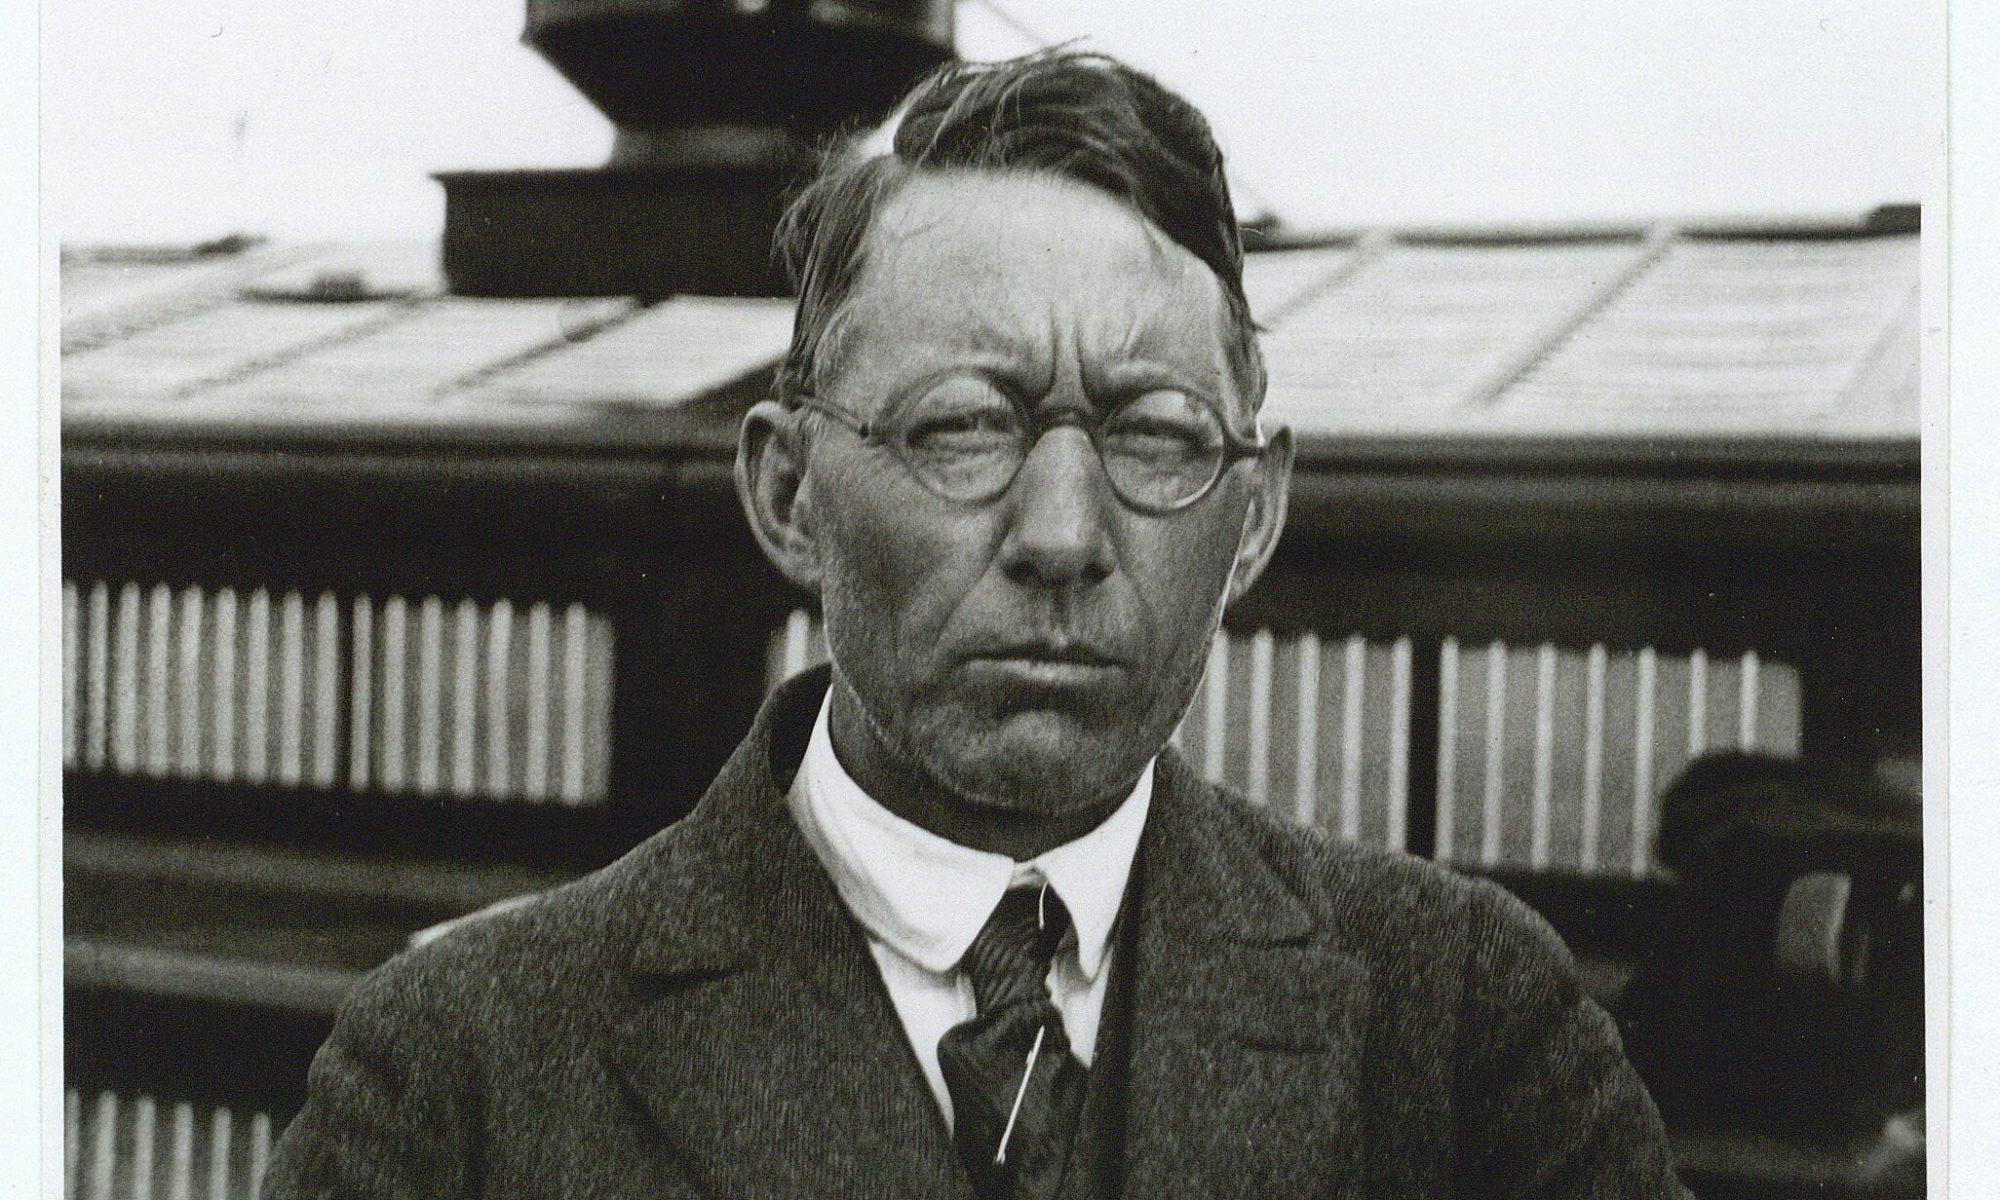 Johannes V. Jensen & Thit jensen Museet